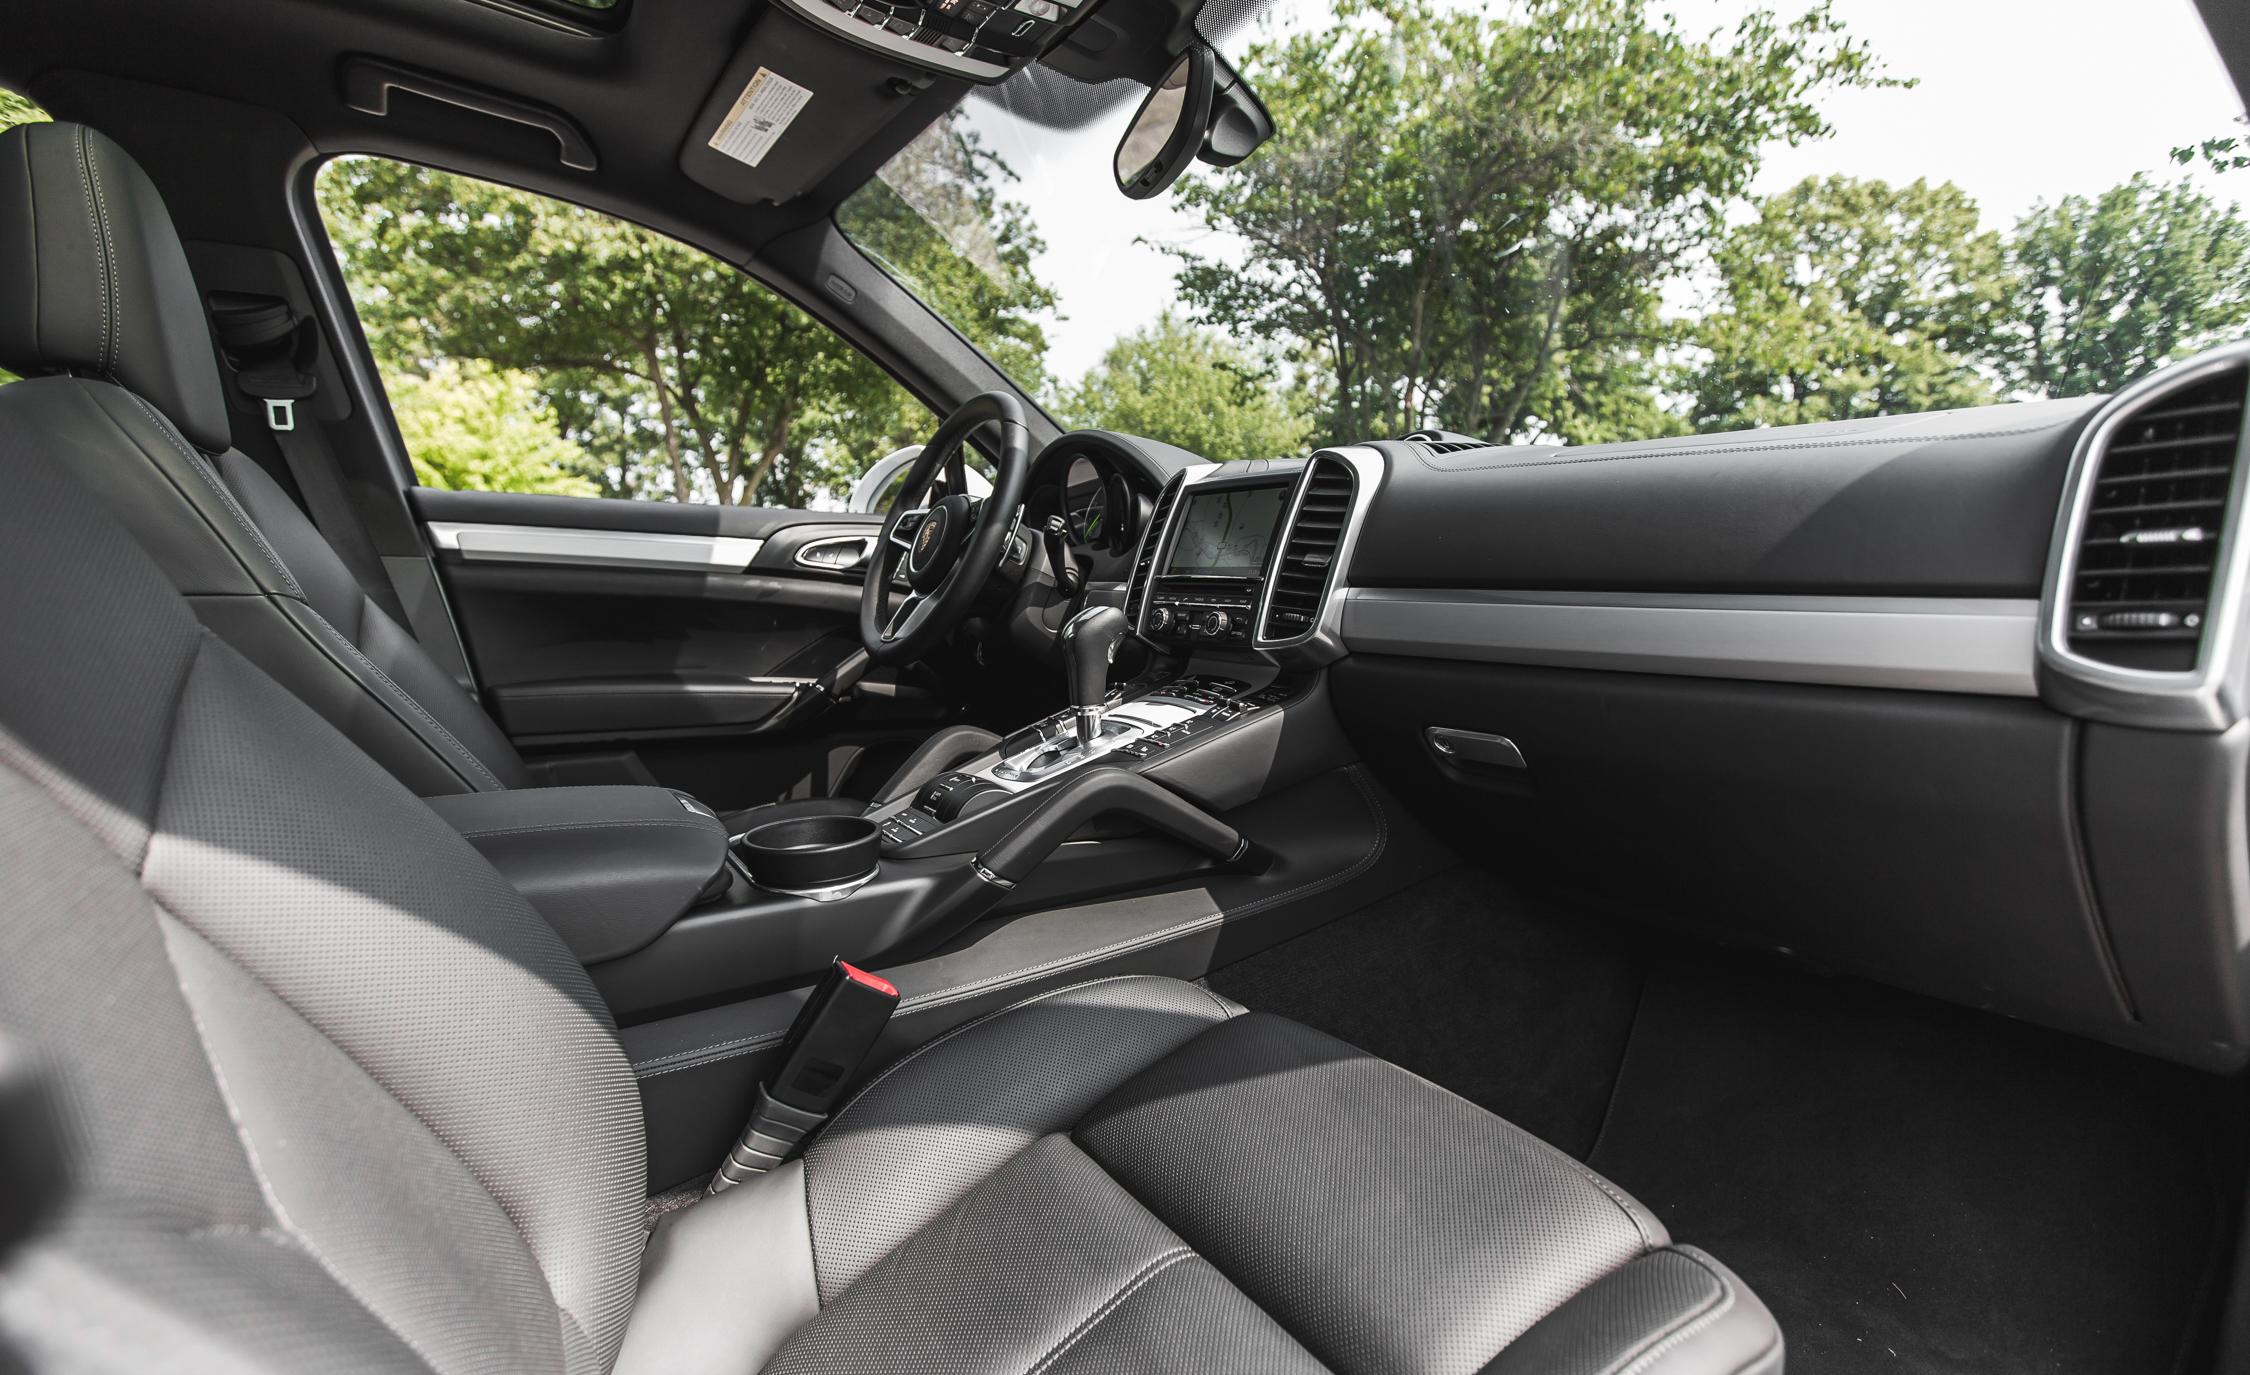 2015 Porsche Cayenne S E-Hybrid Interior Front Seats